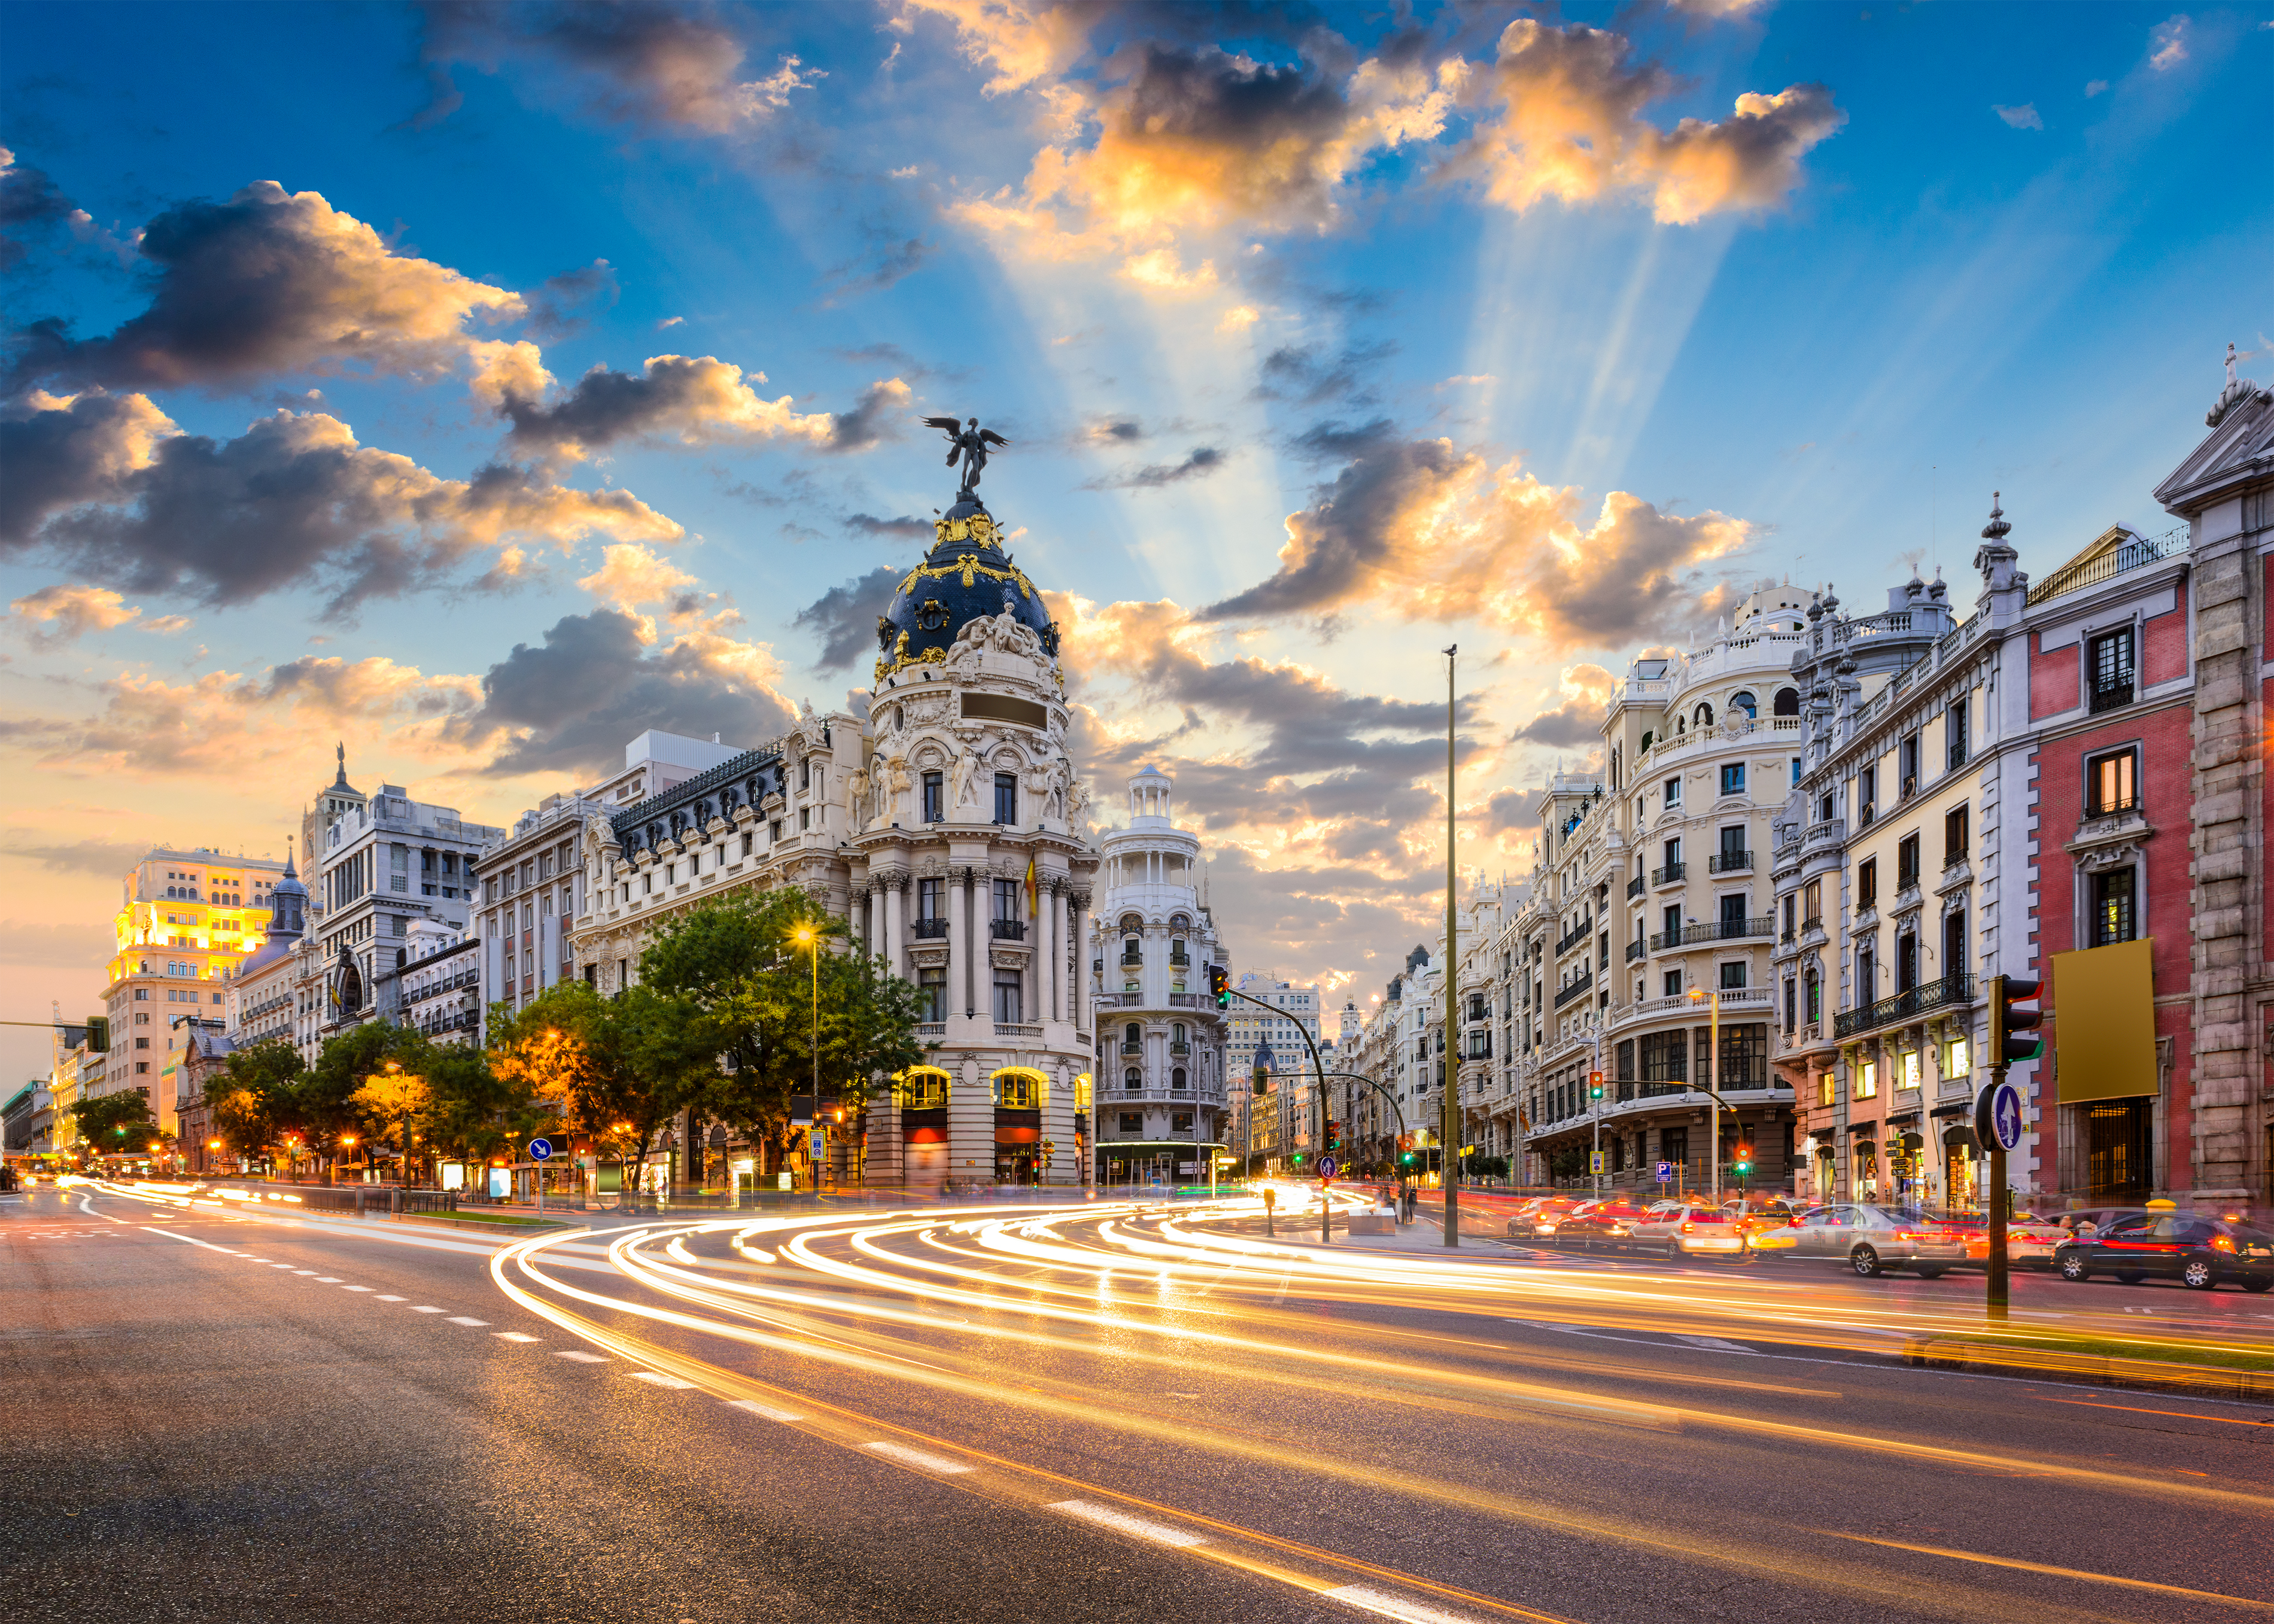 Atardecer en las calles de Madrid, España